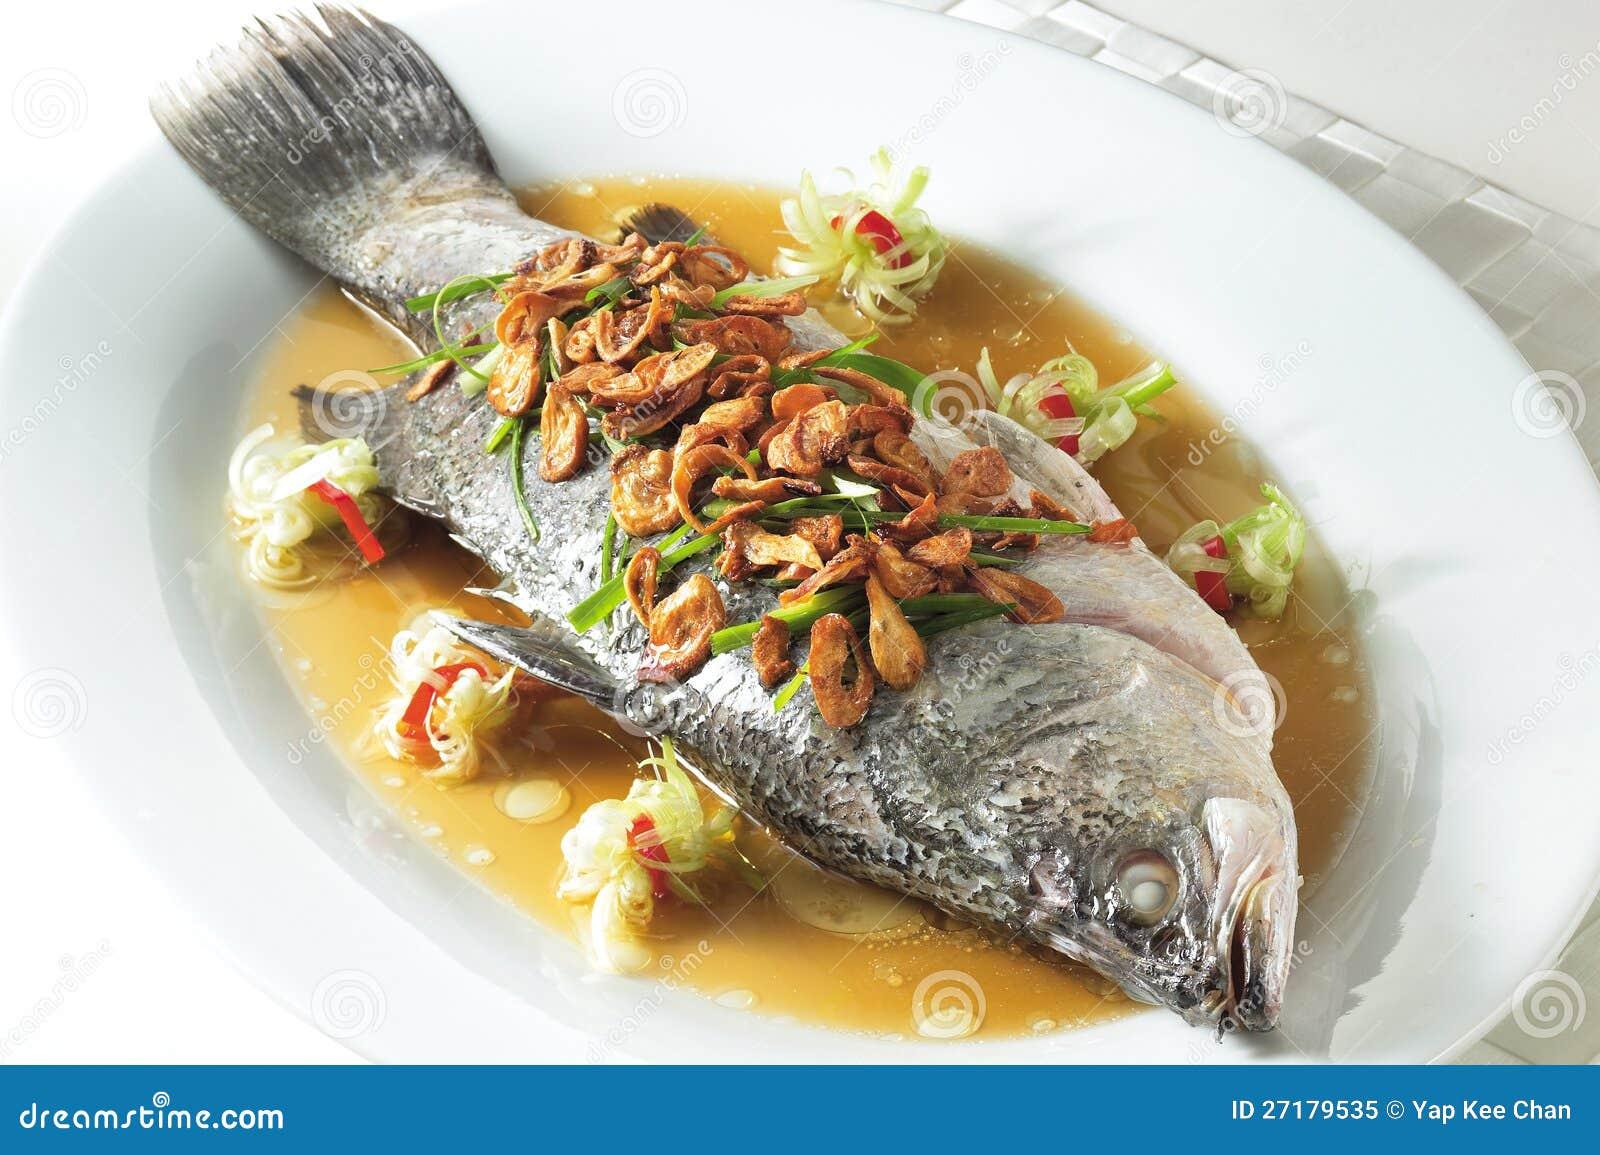 Steam Fish Royalty Free Stock Photo - Image: 27179535